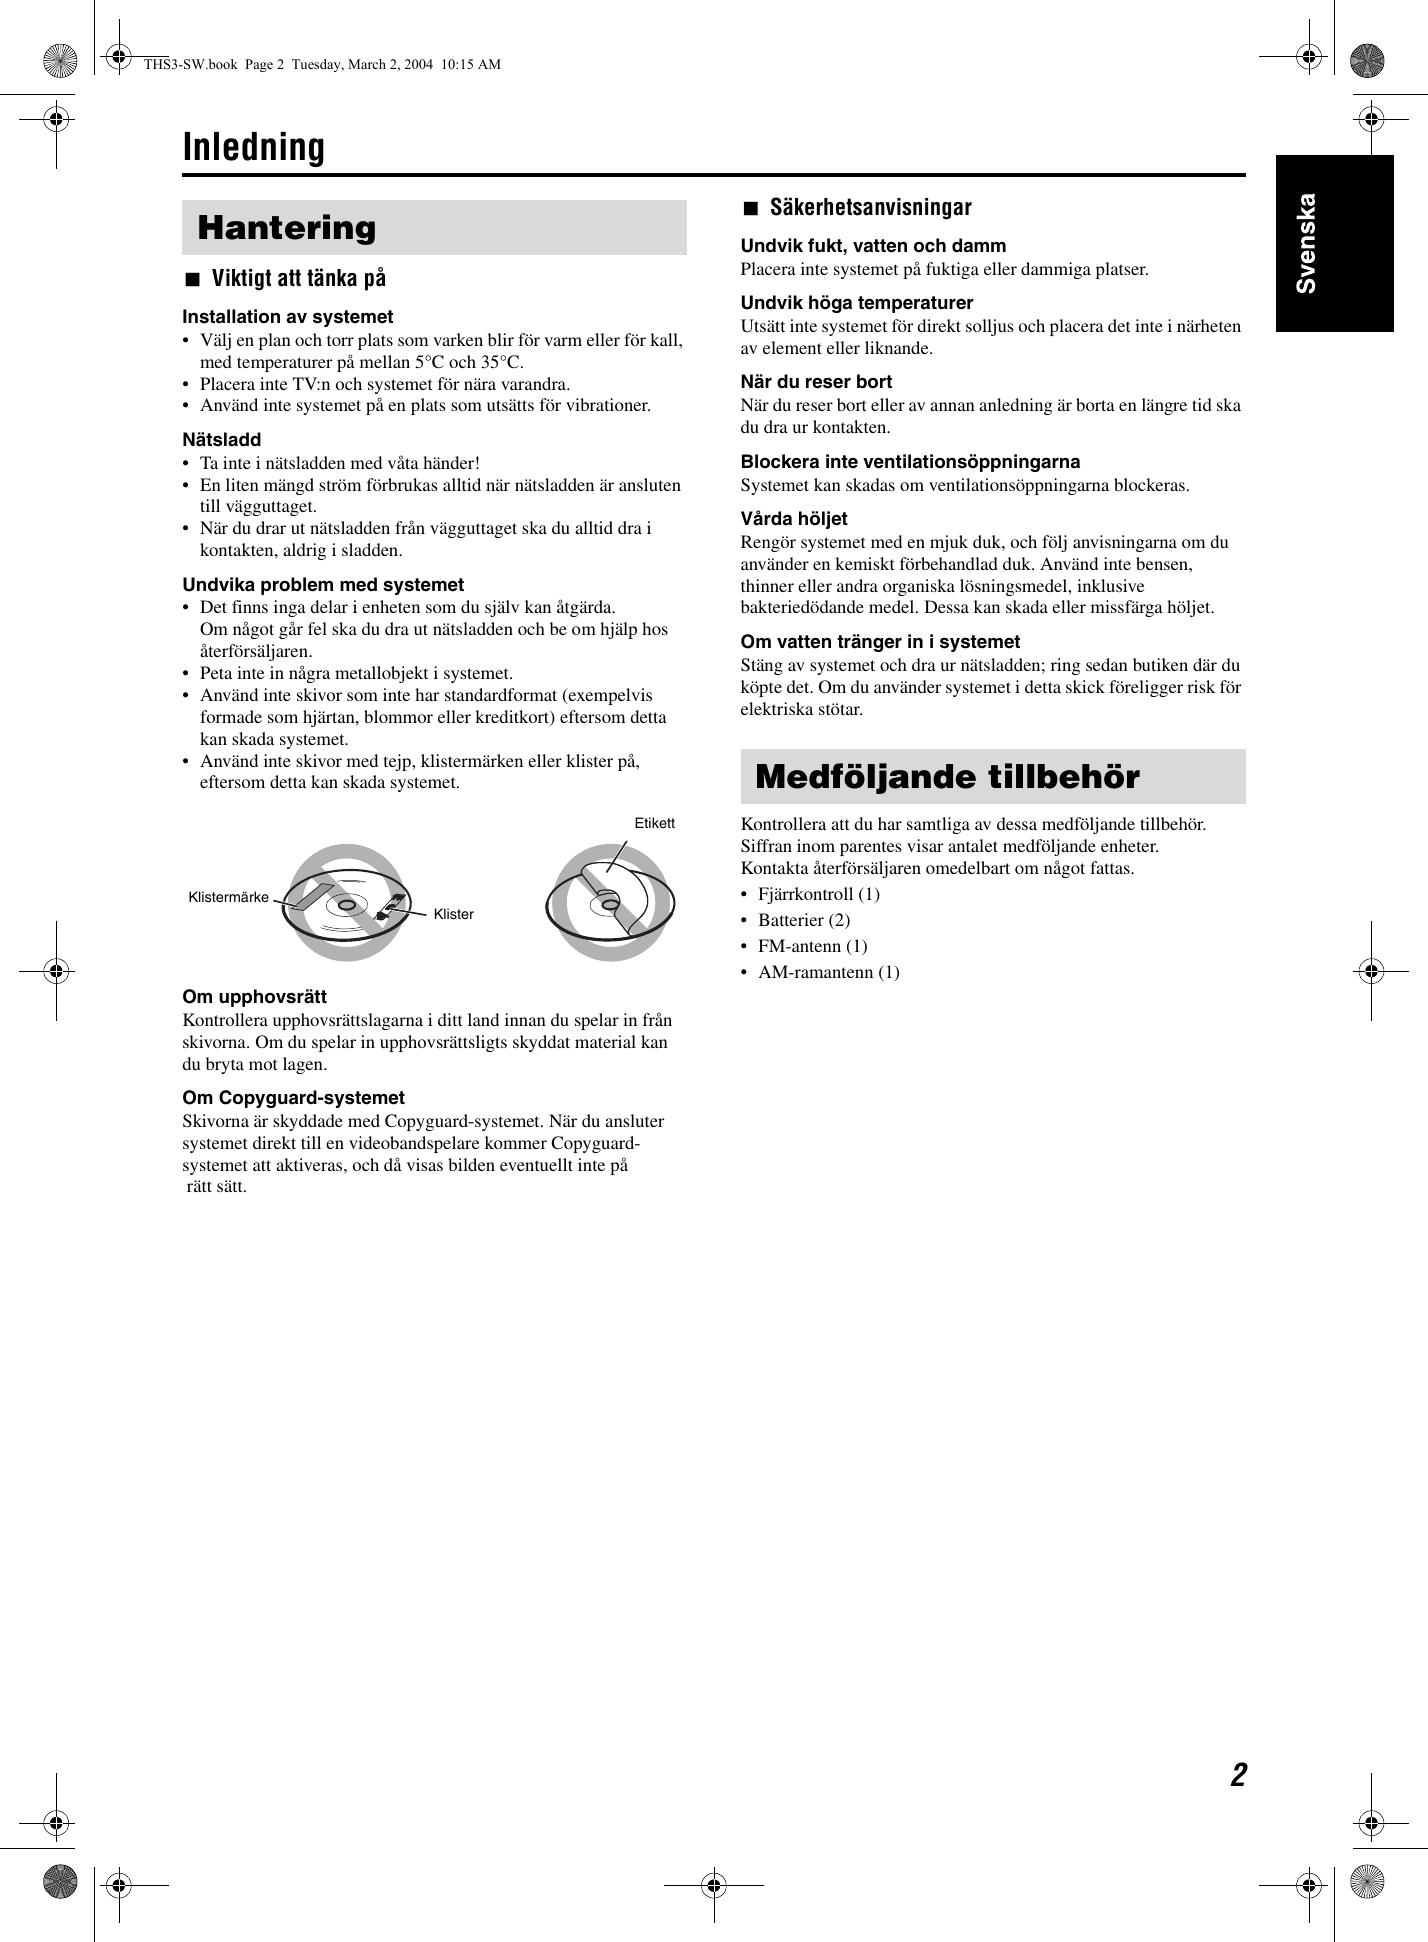 Refinery29 rencontres apps